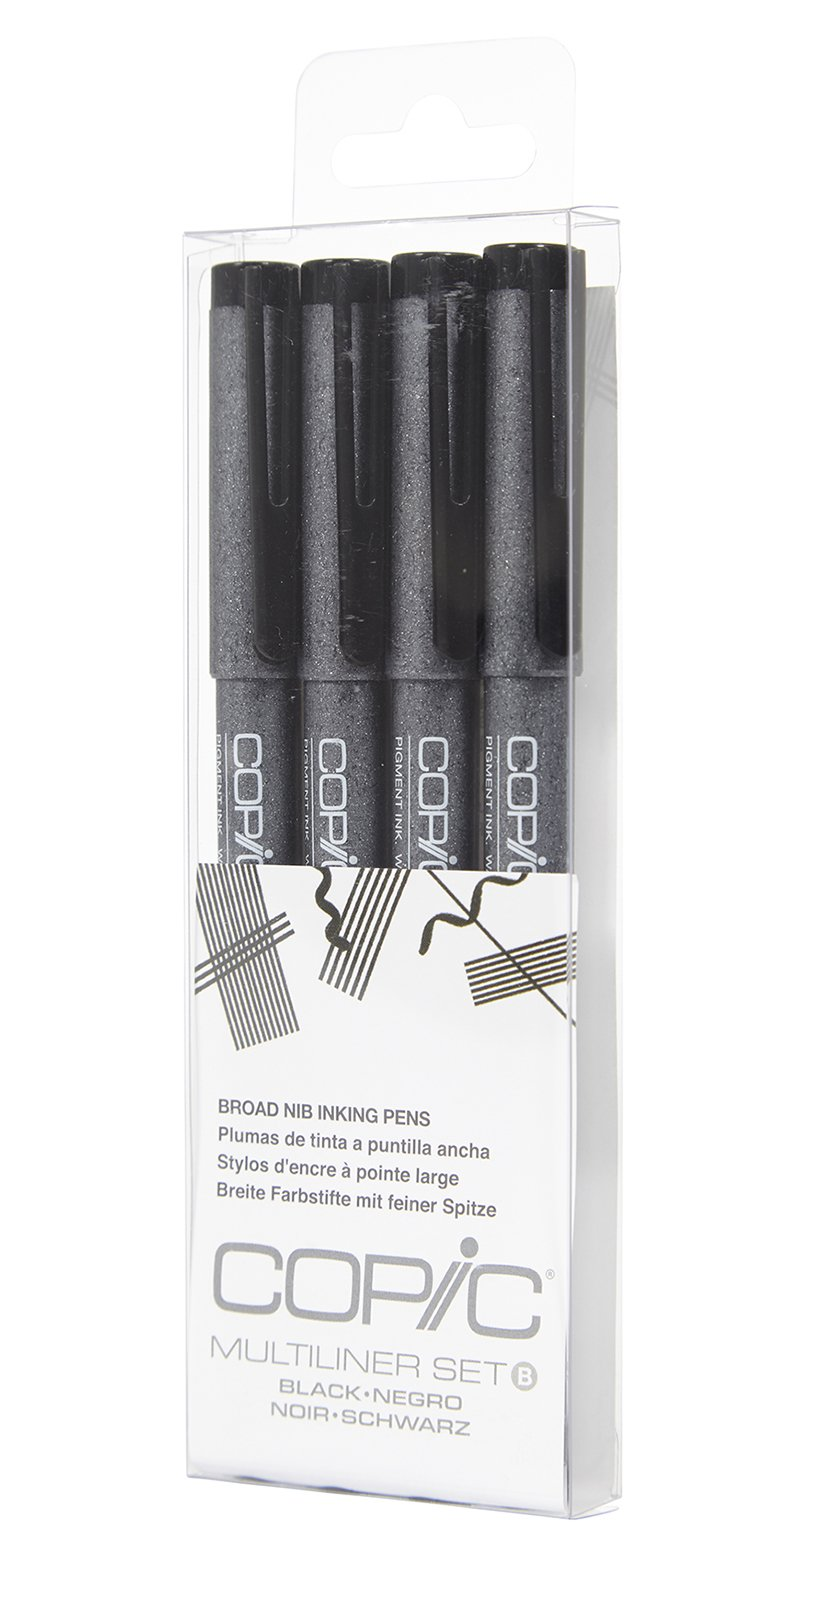 Copic Markers MLBBROAD Multiliner Broad Pigment Based Ink, 4-Piece Set